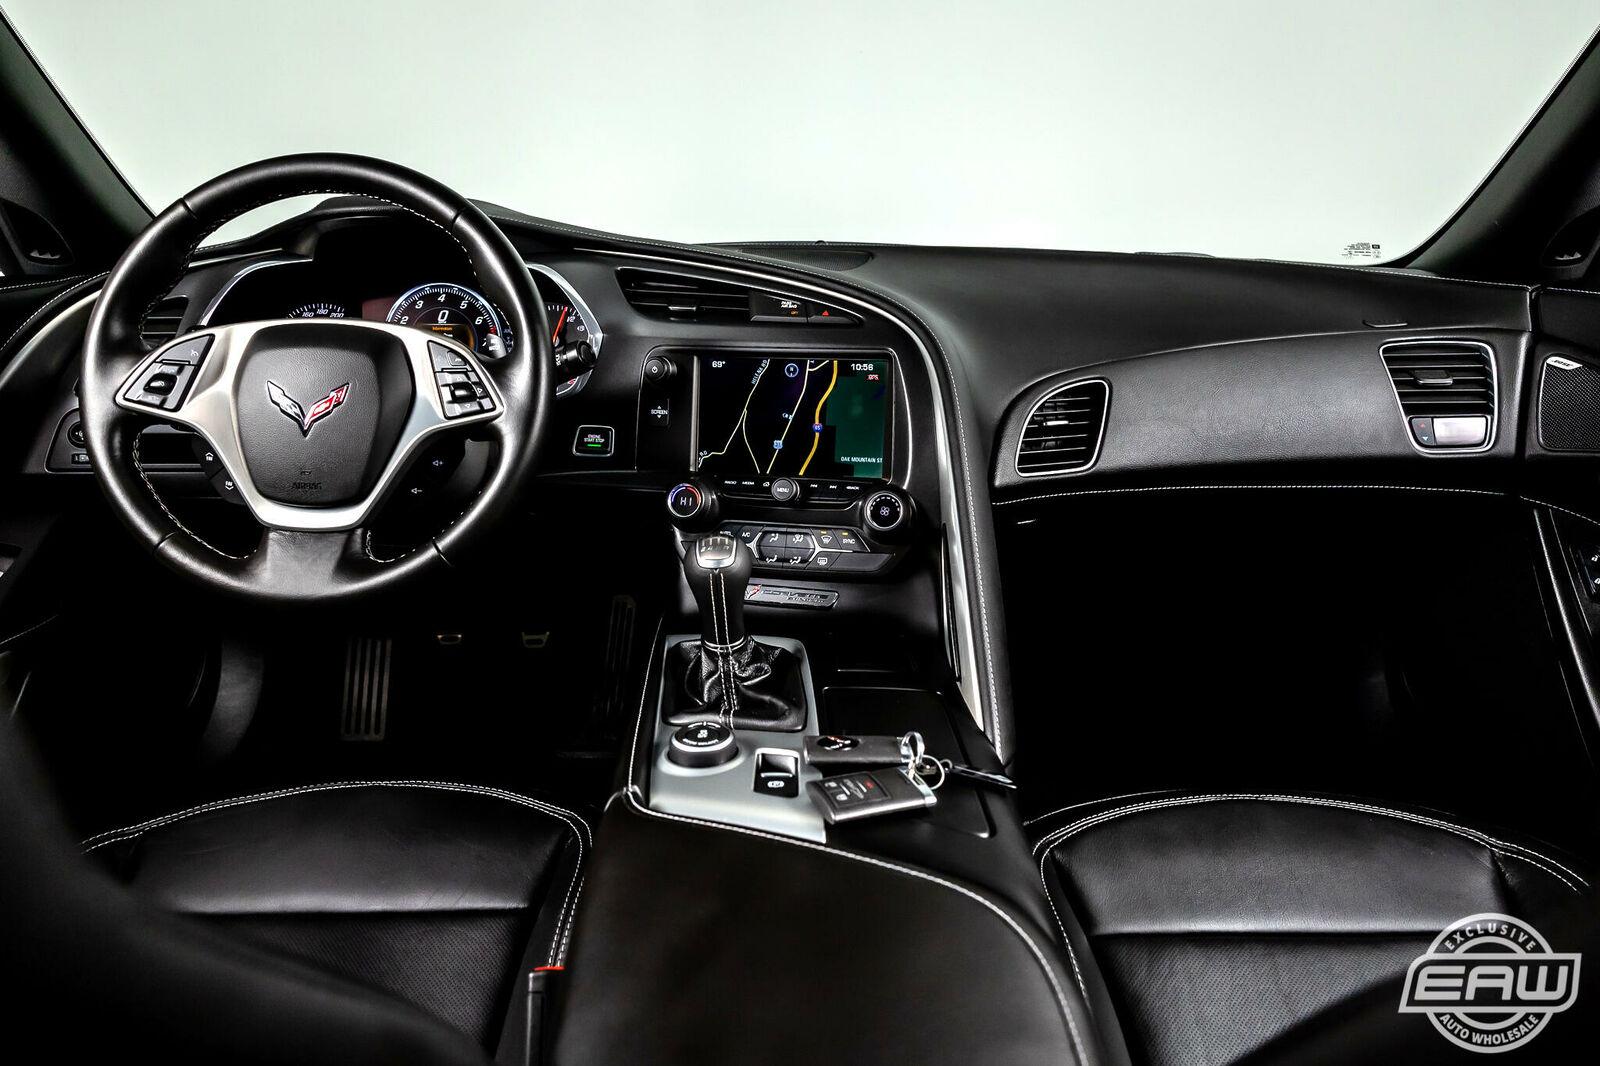 2014 Black Chevrolet Corvette Coupe 1LT | C7 Corvette Photo 2